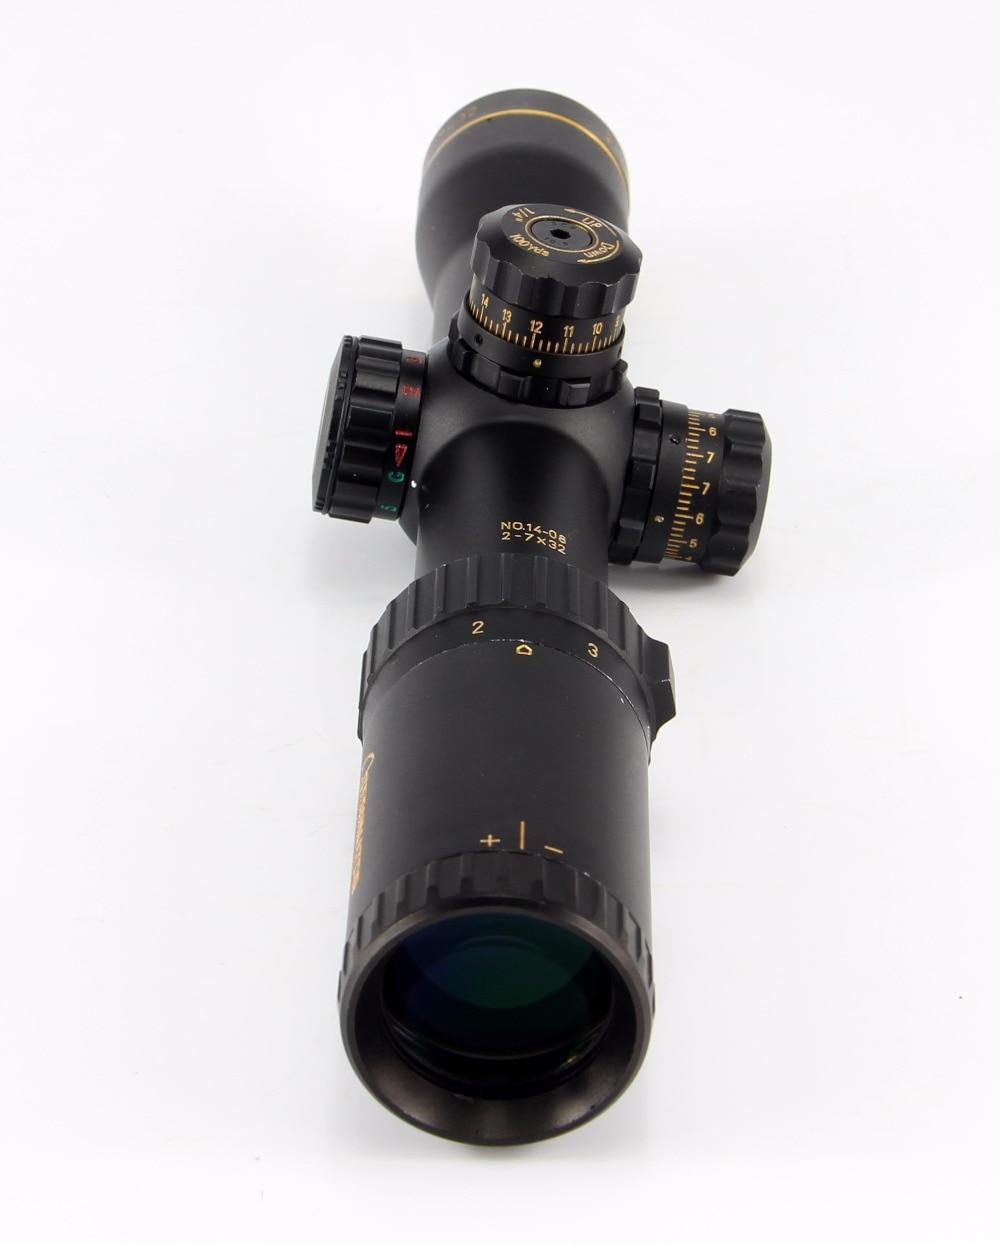 купить 2-7x32 Professional Tactical Rifle Scope Airsoft riflescope For Outdoor Sports Hunting Air Gun онлайн